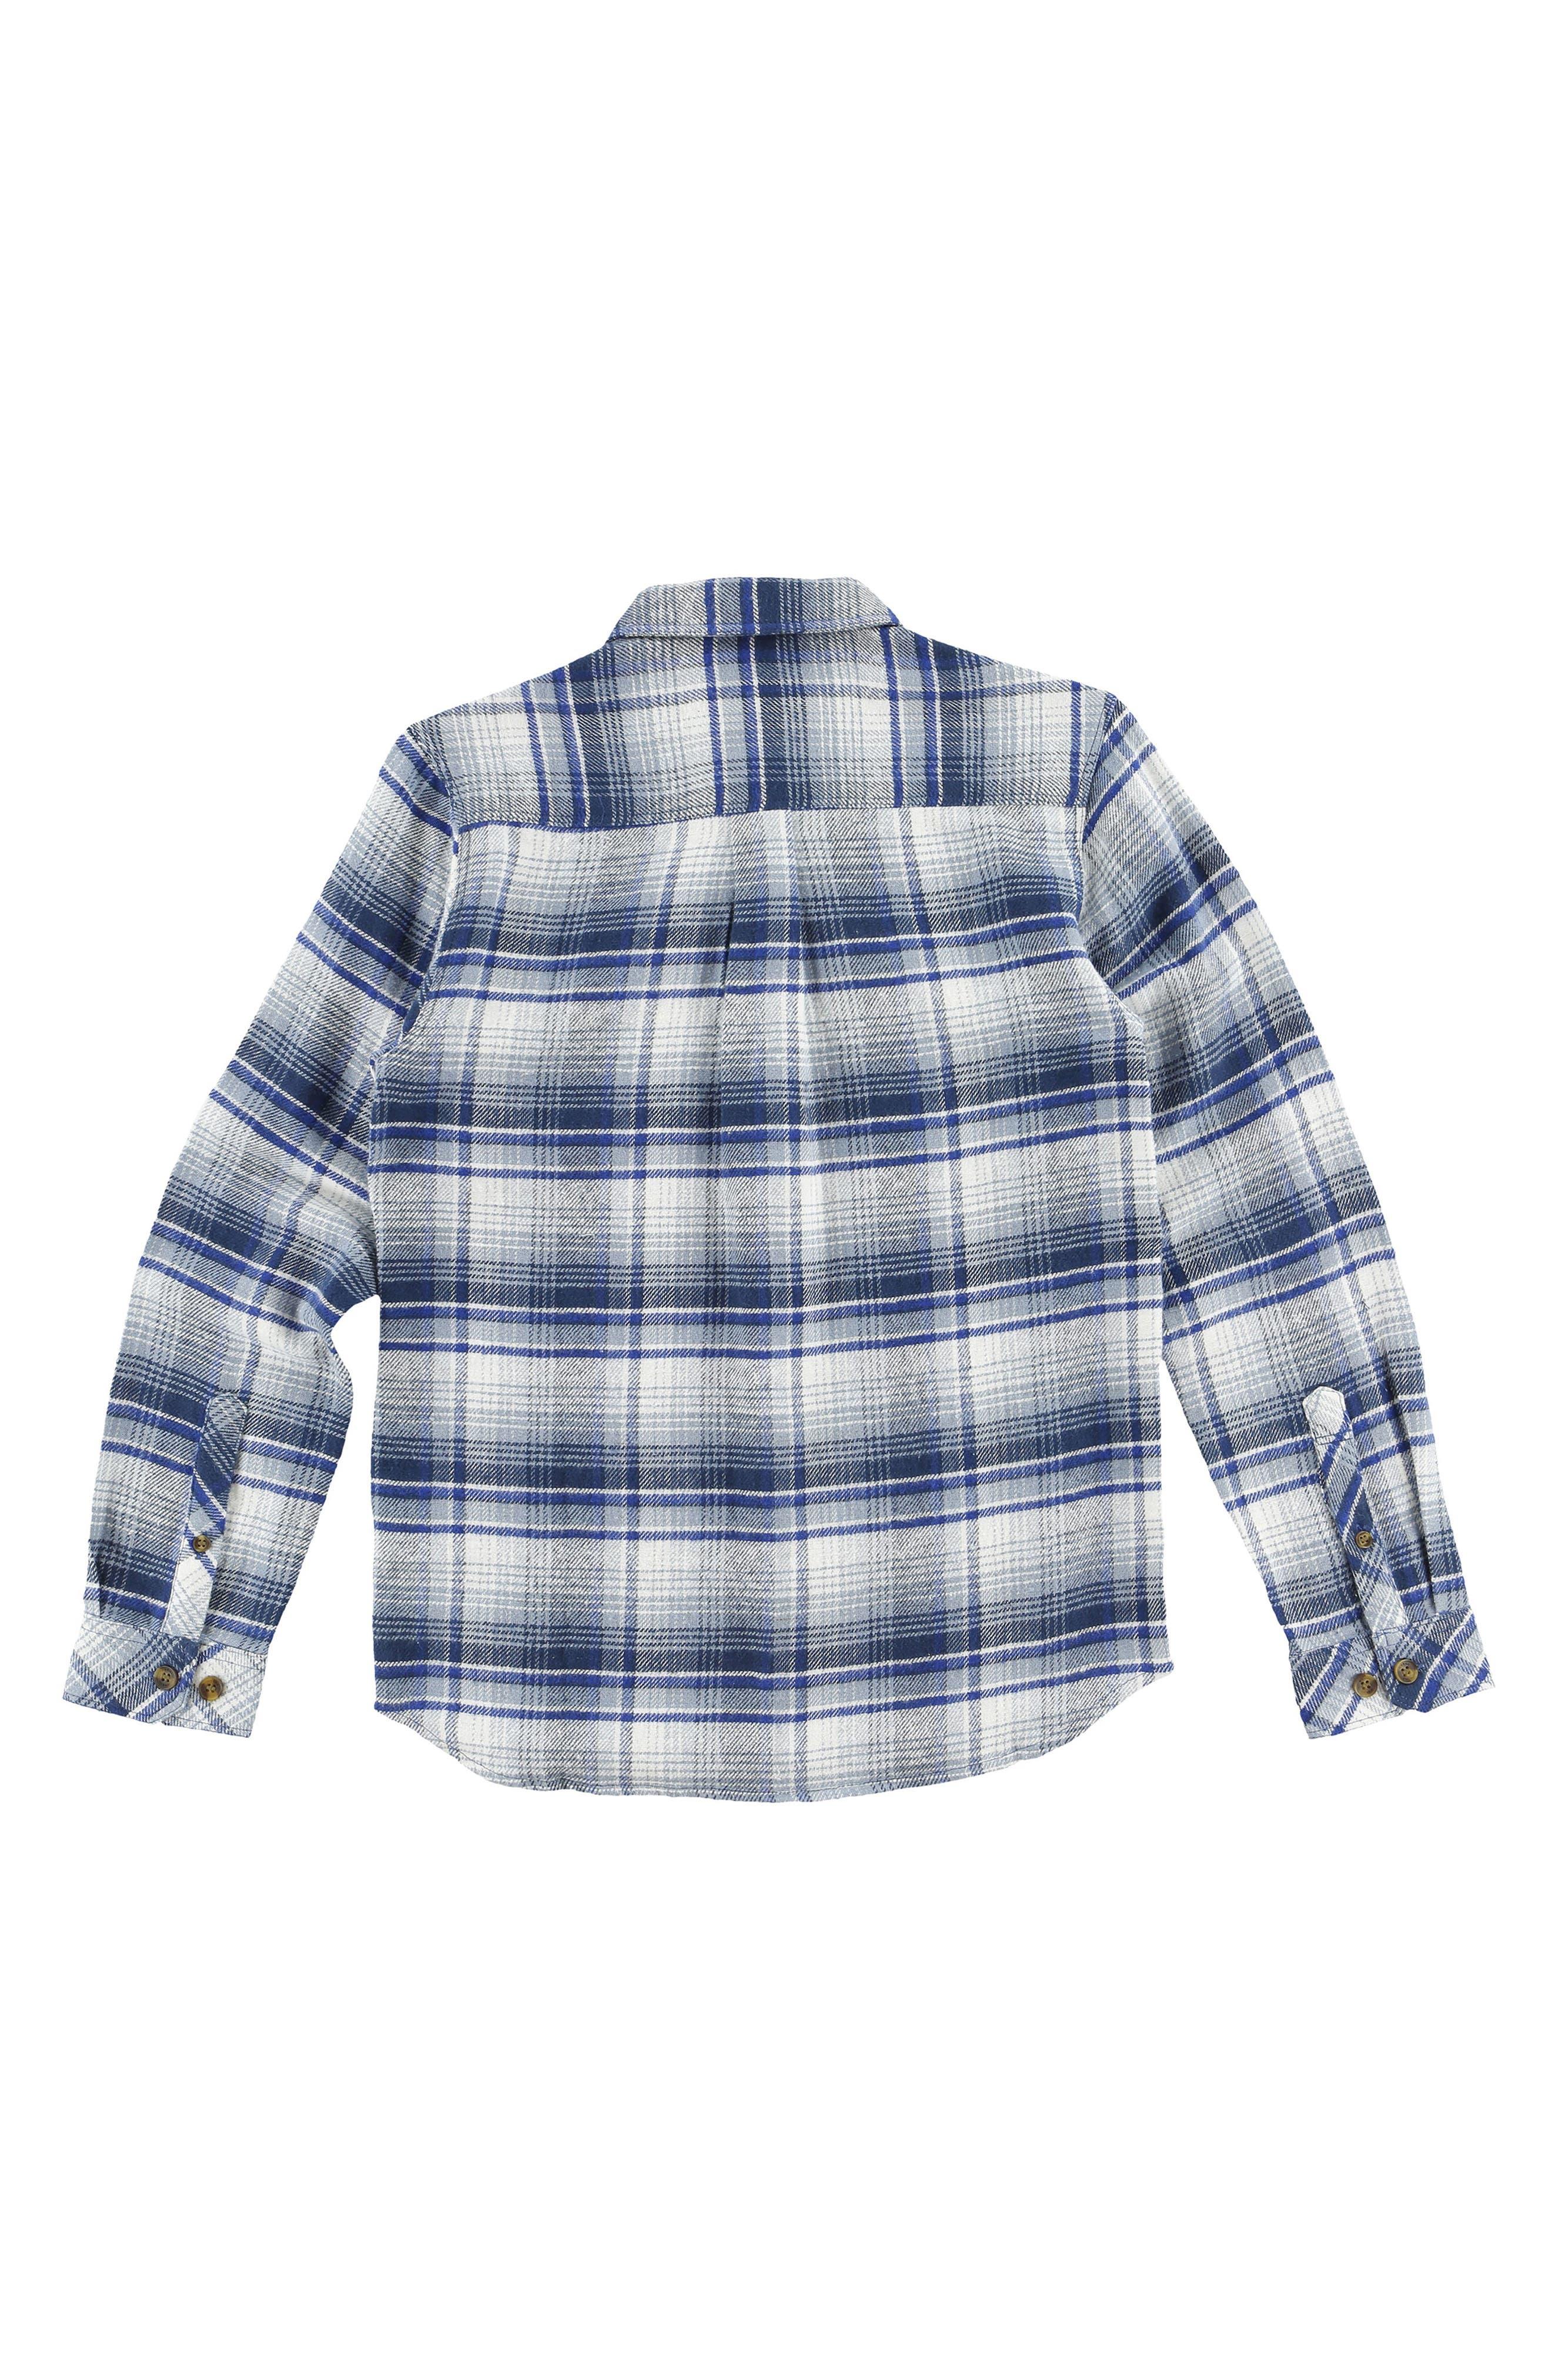 Butler Plaid Flannel Shirt,                         Main,                         color, 472